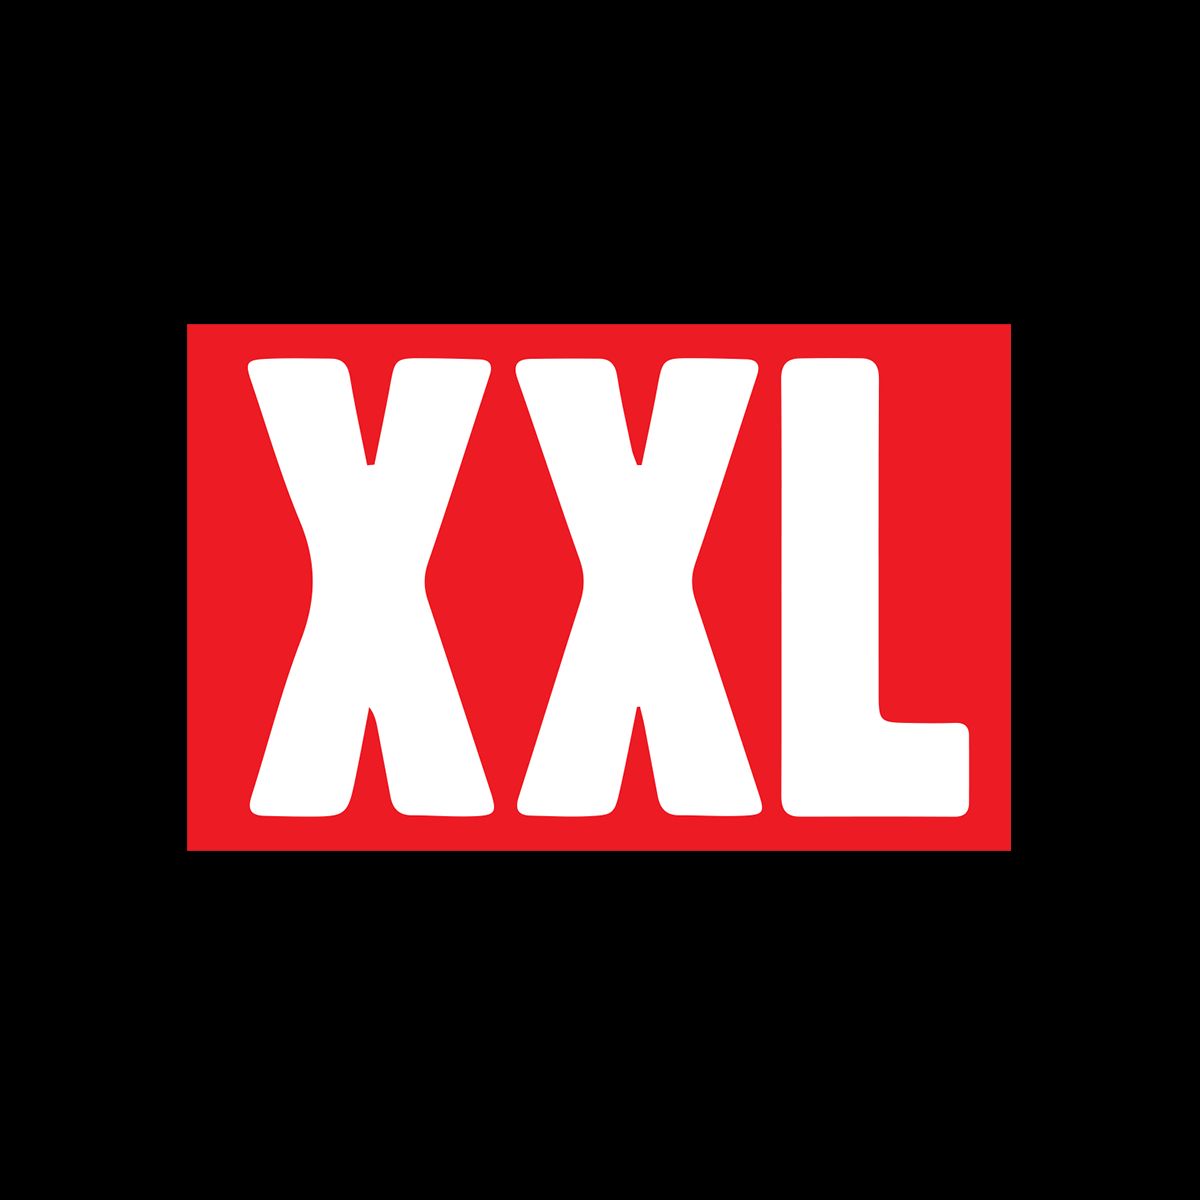 Avatar - XXL